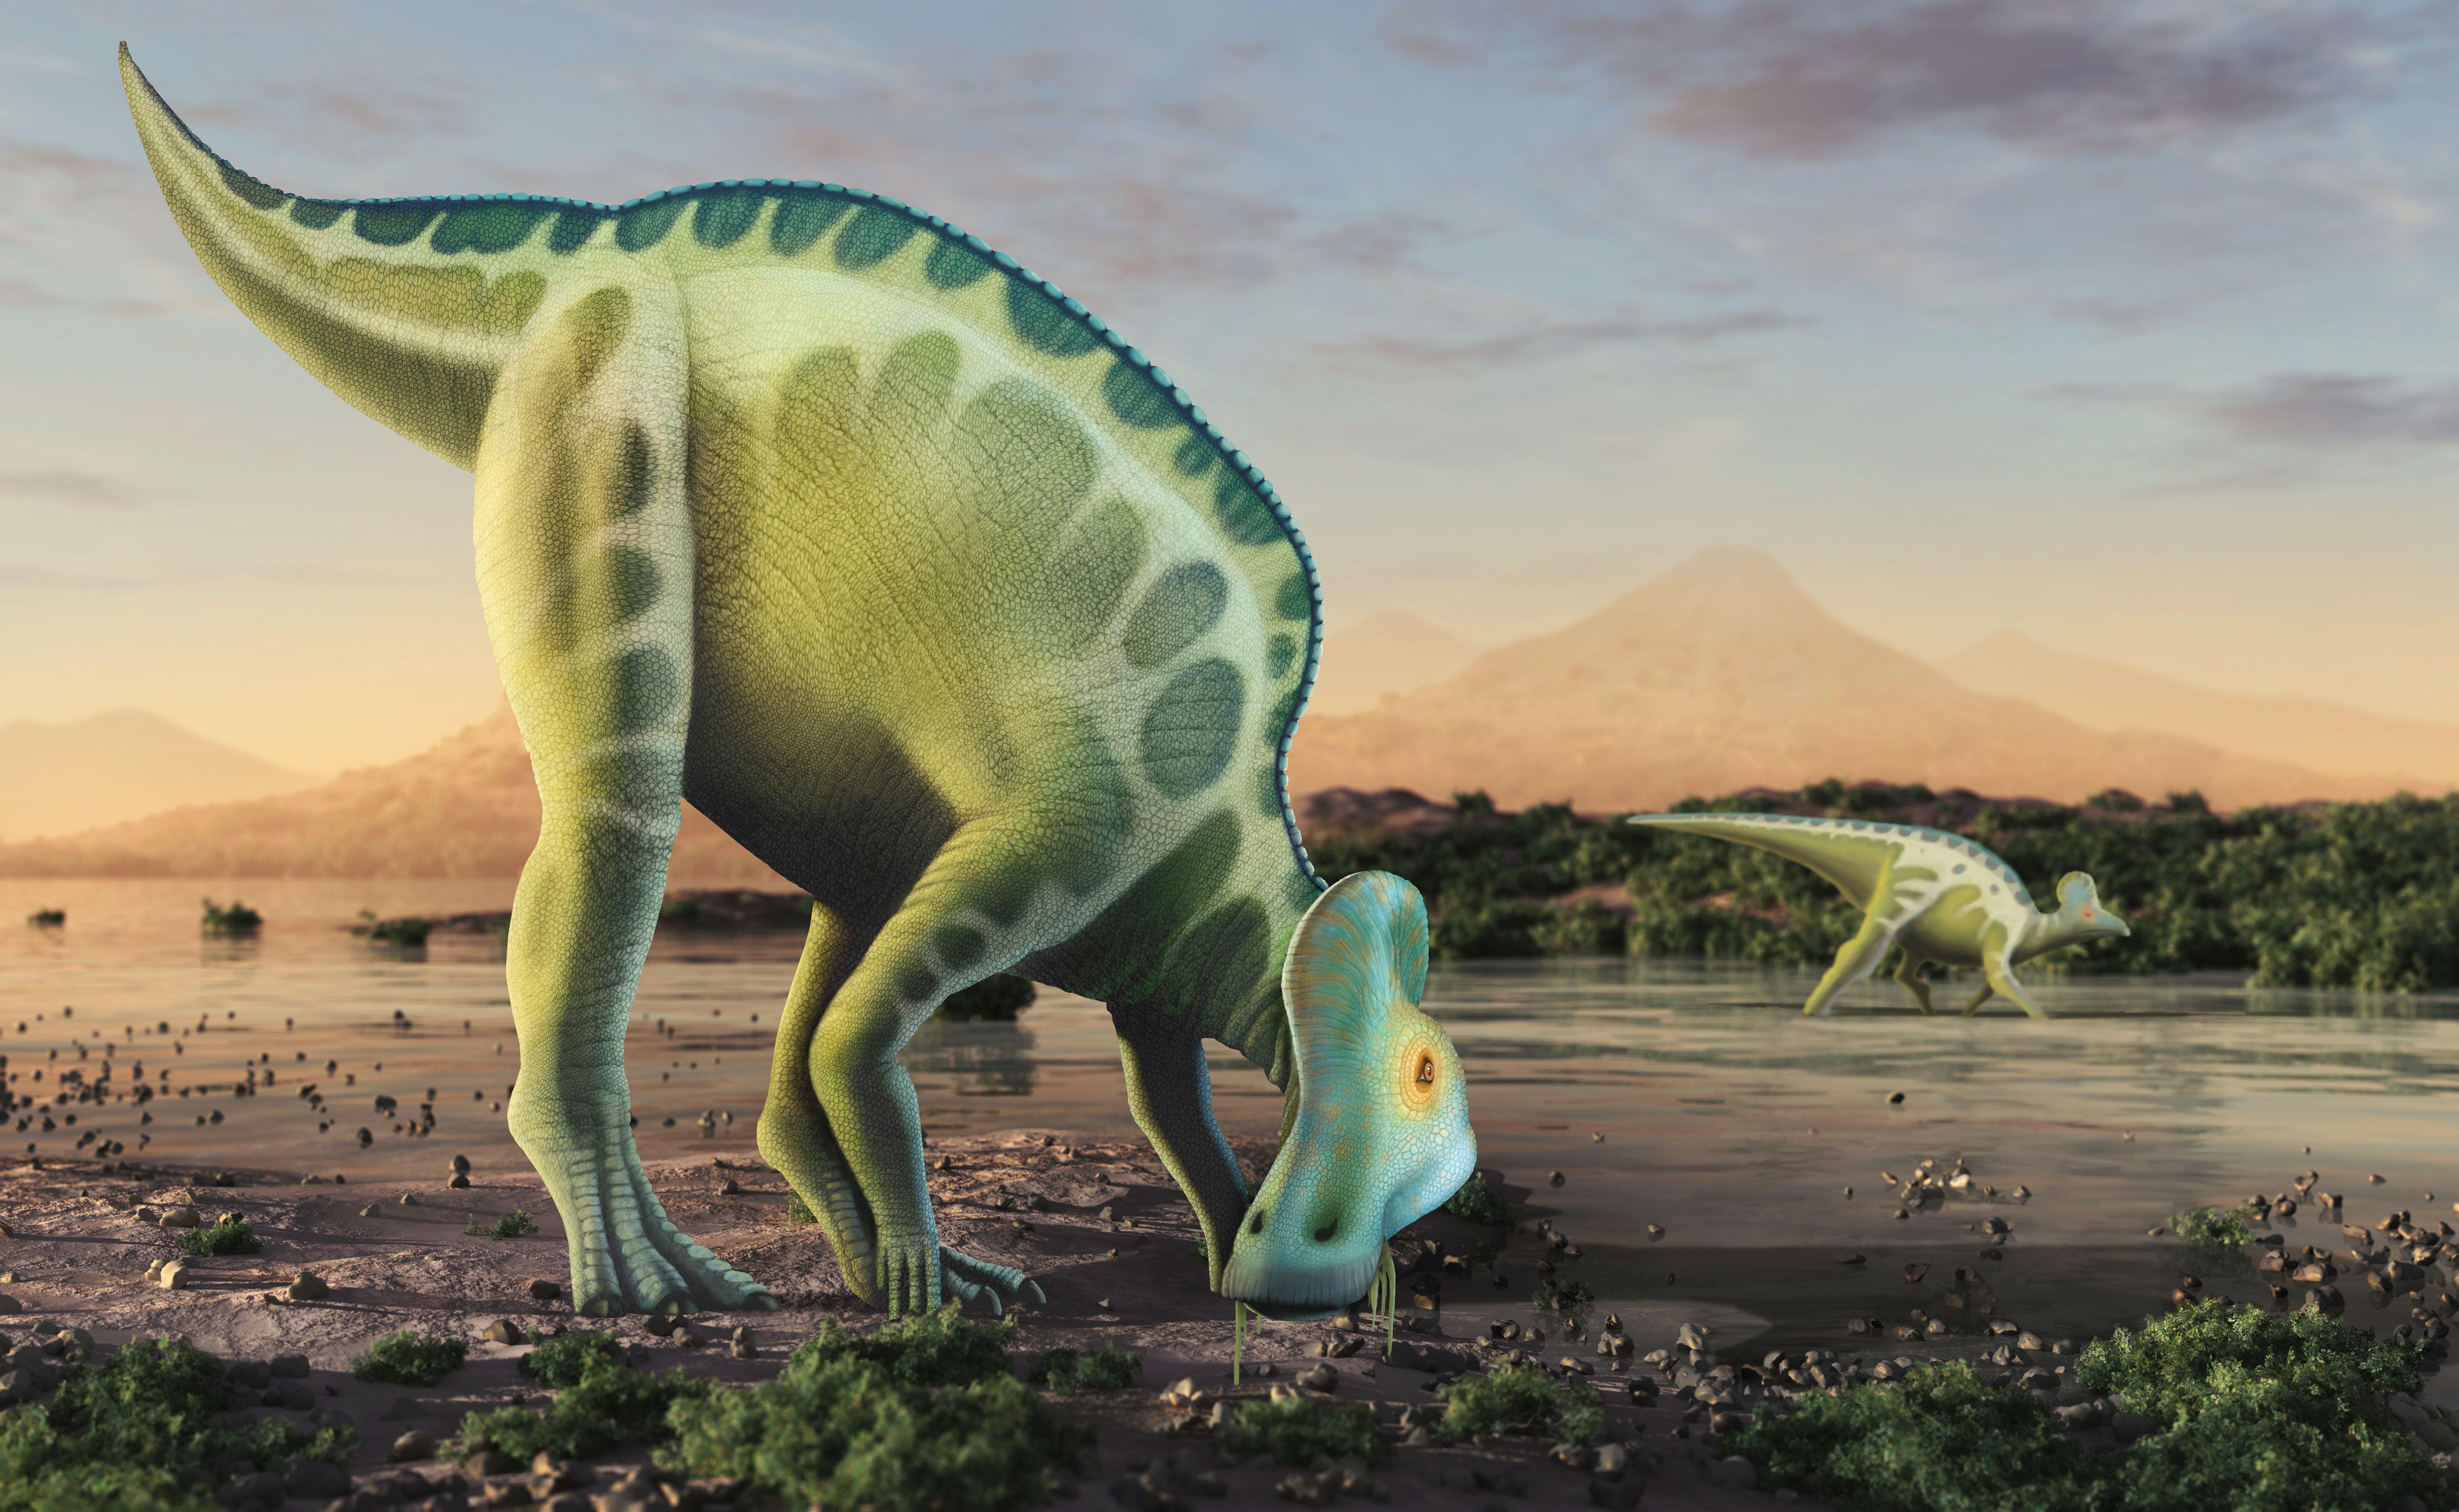 Colorful illustration of a hardosaurid in its natural habitat.